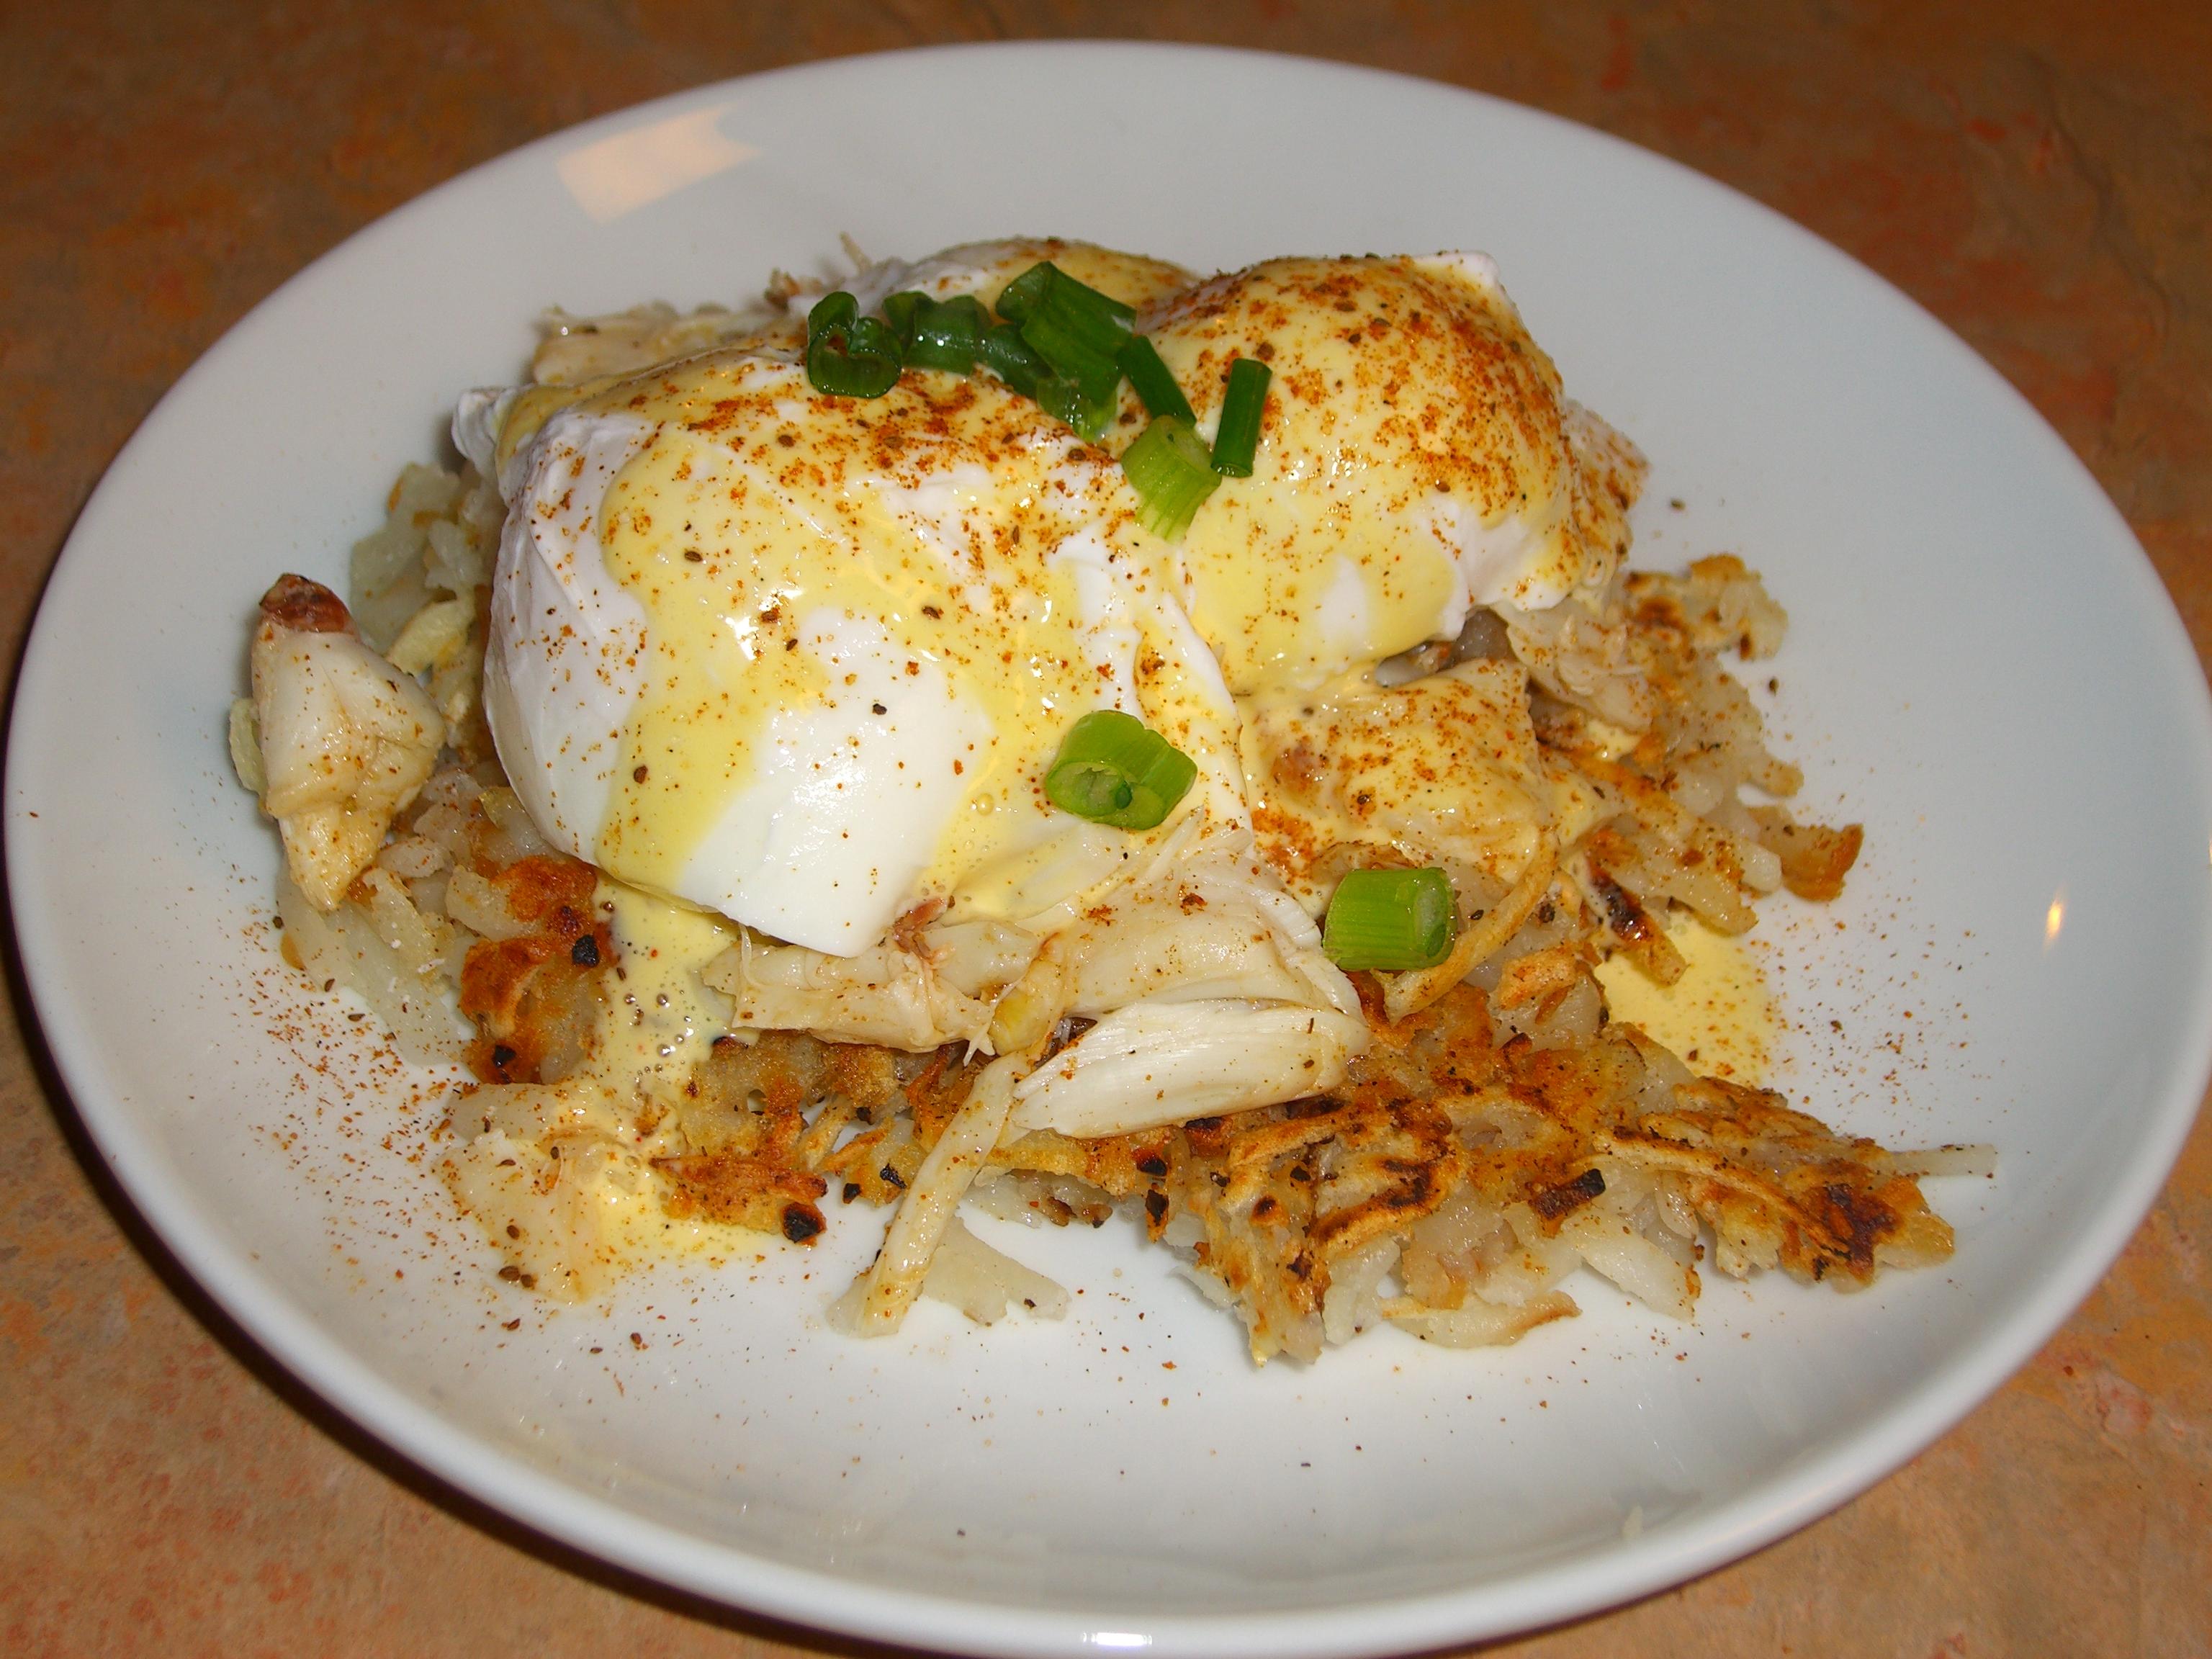 Old Bay Crab Eggs Bendict